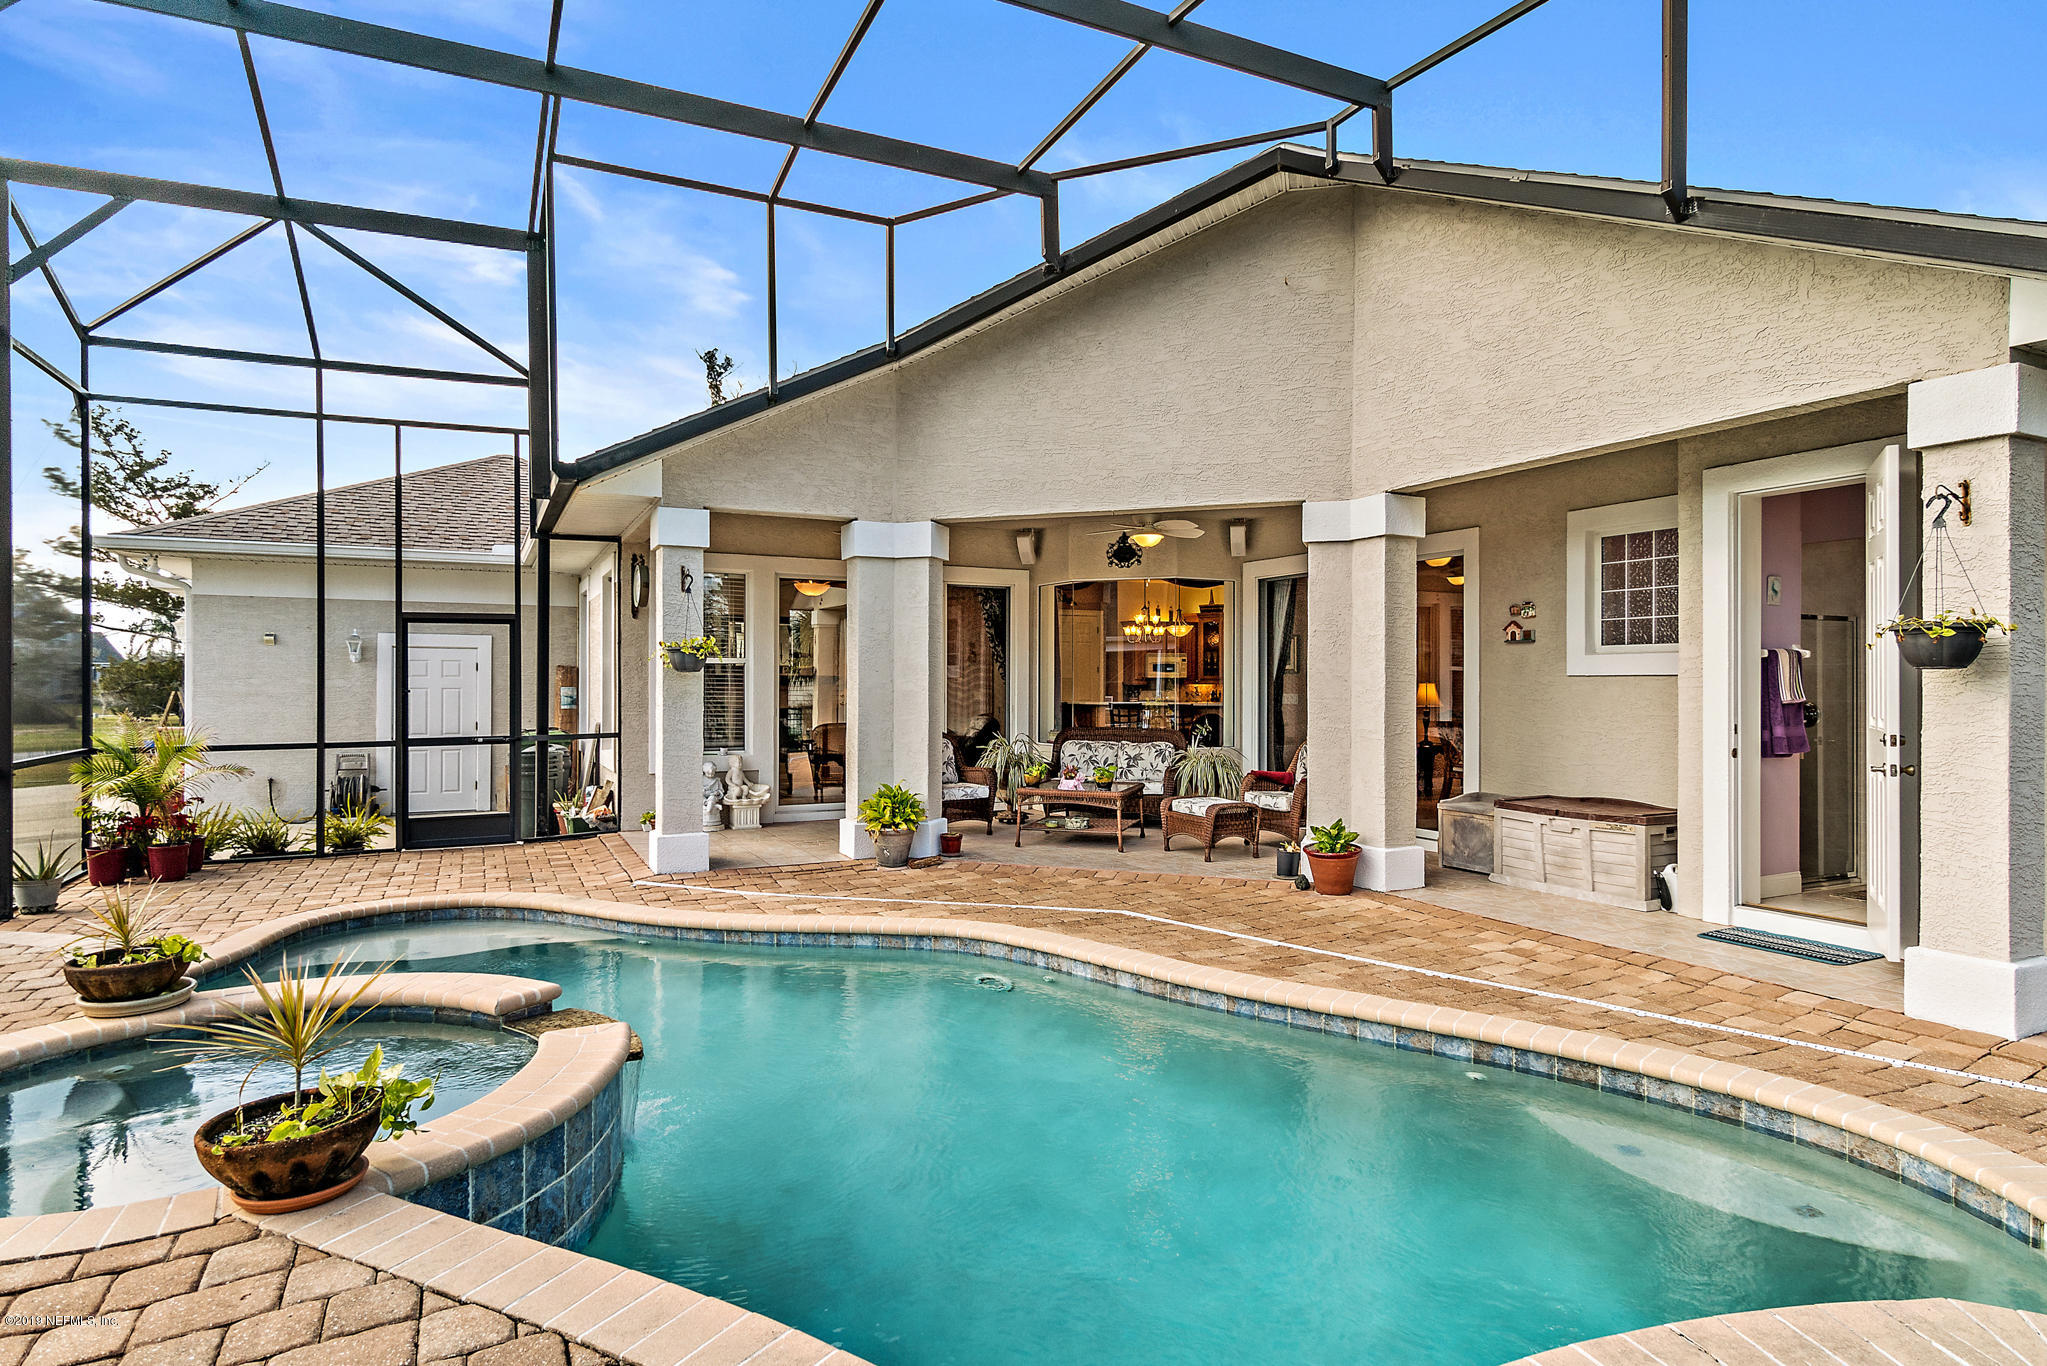 113 GAILLARDIA, ST AUGUSTINE, FLORIDA 32080, 4 Bedrooms Bedrooms, ,3 BathroomsBathrooms,Residential - single family,For sale,GAILLARDIA,979251